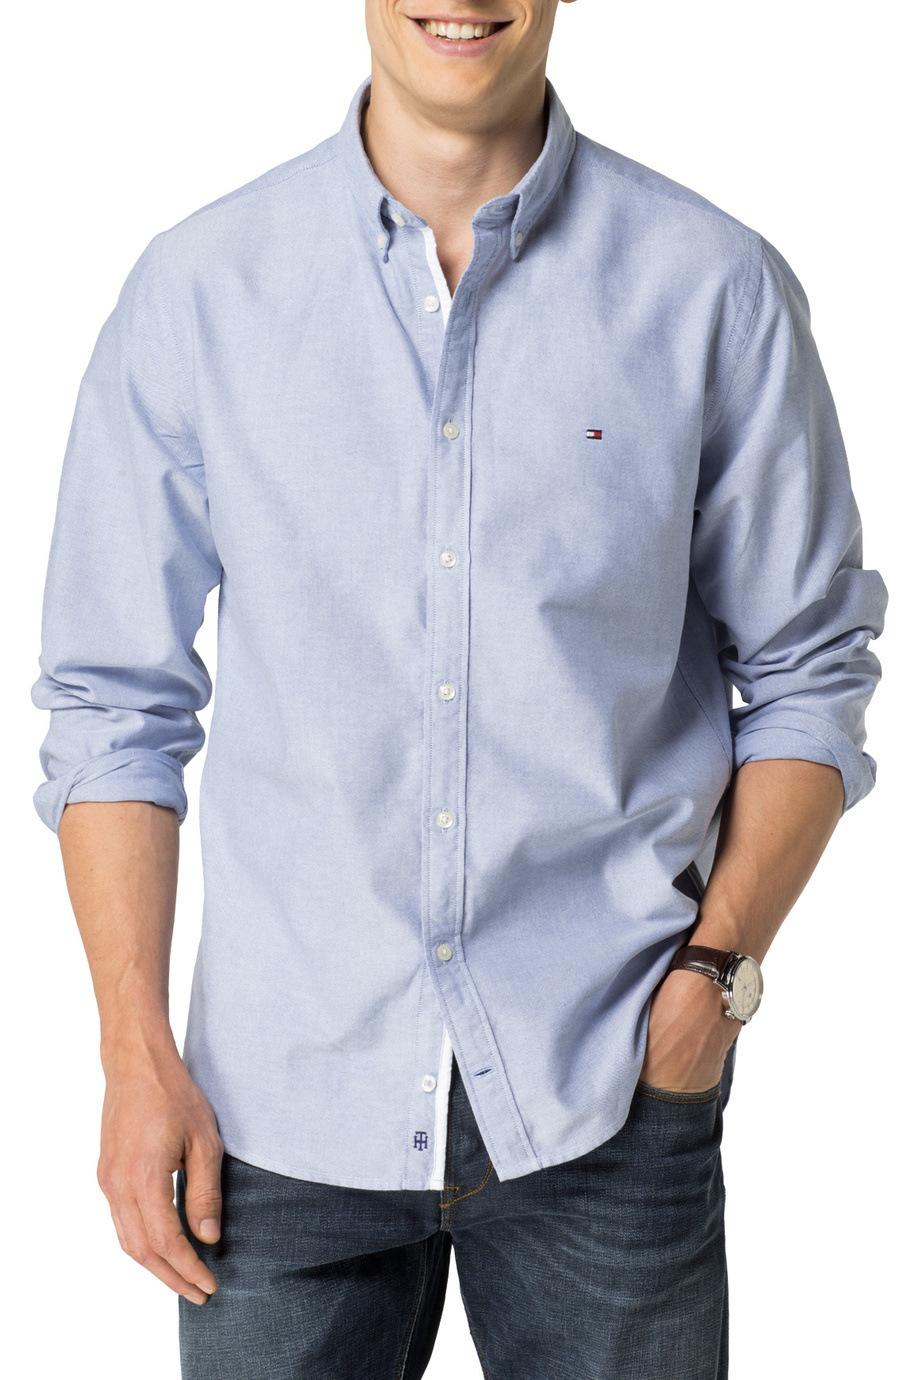 13d4f2651 Tommy Hilfiger Mens Oxford Short Sleeve Shirt - BCD Tofu House